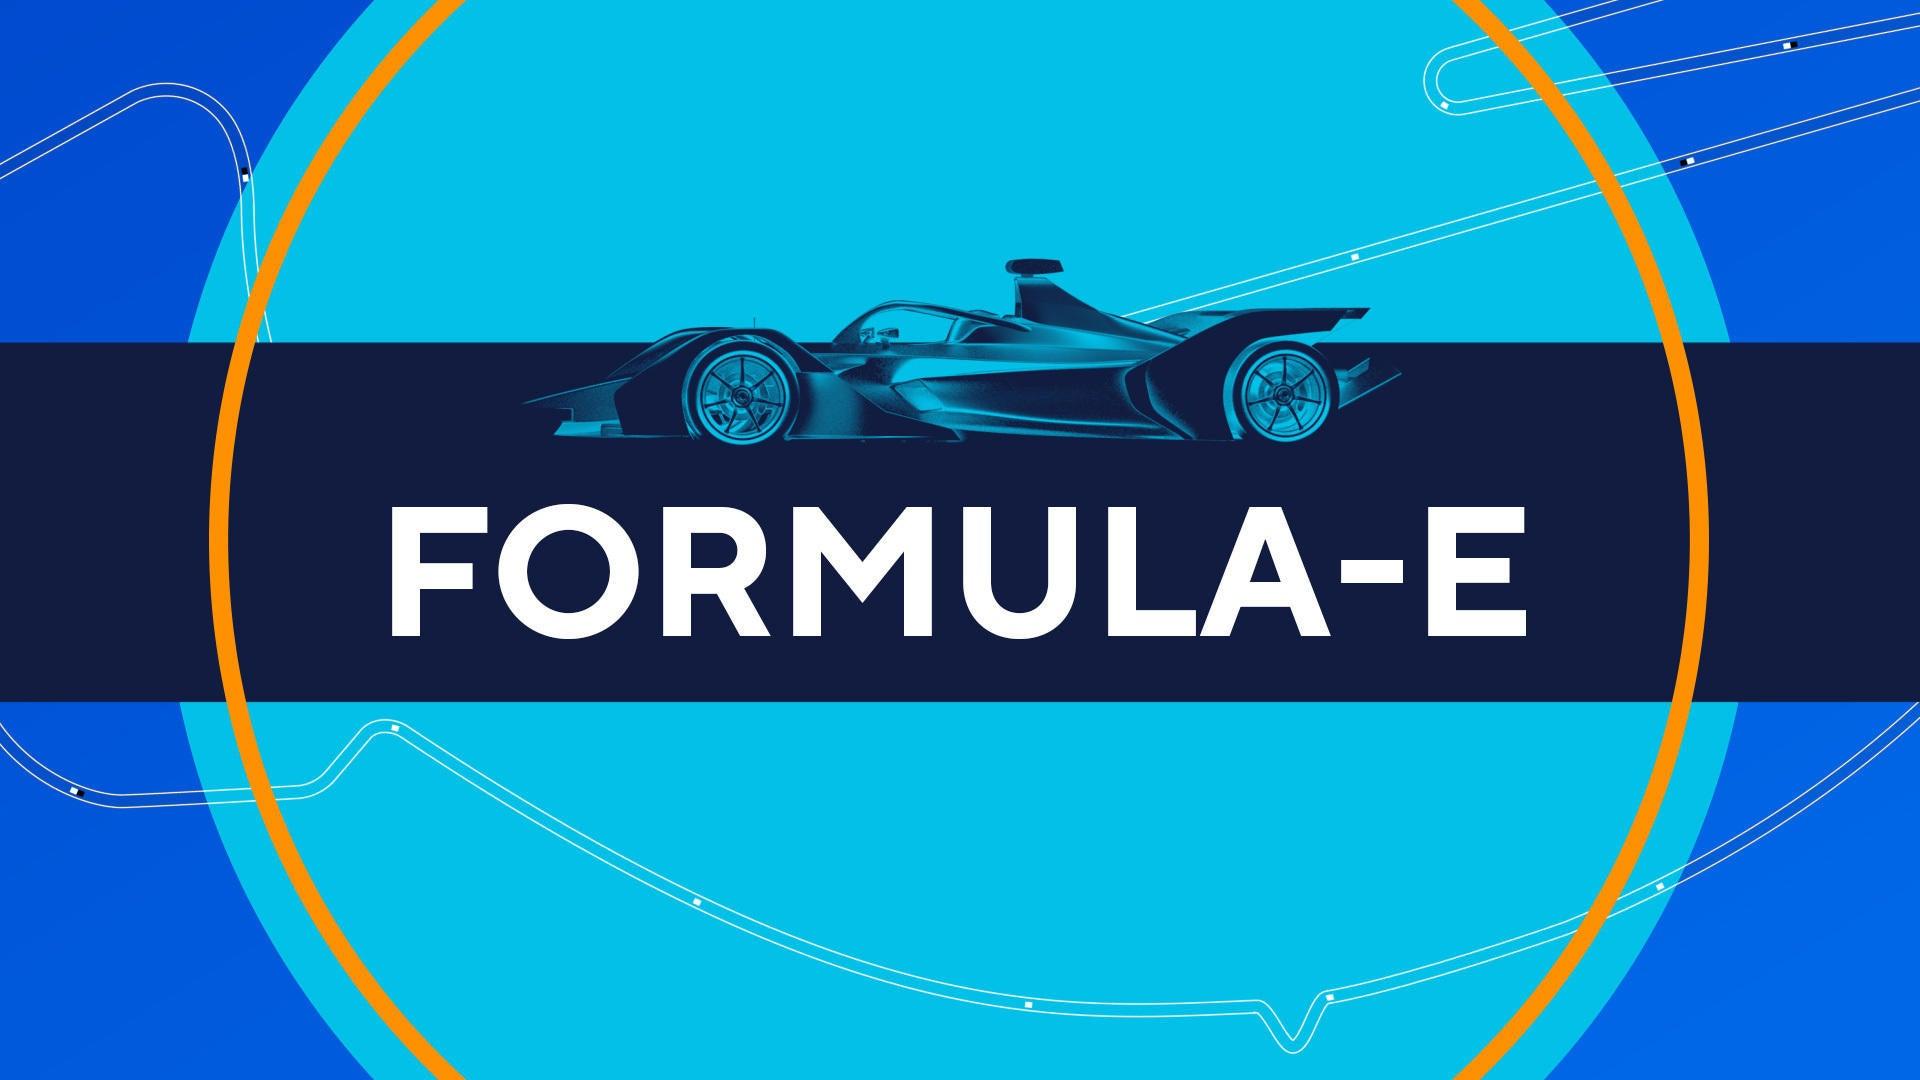 formulae-fullscreen-6-1